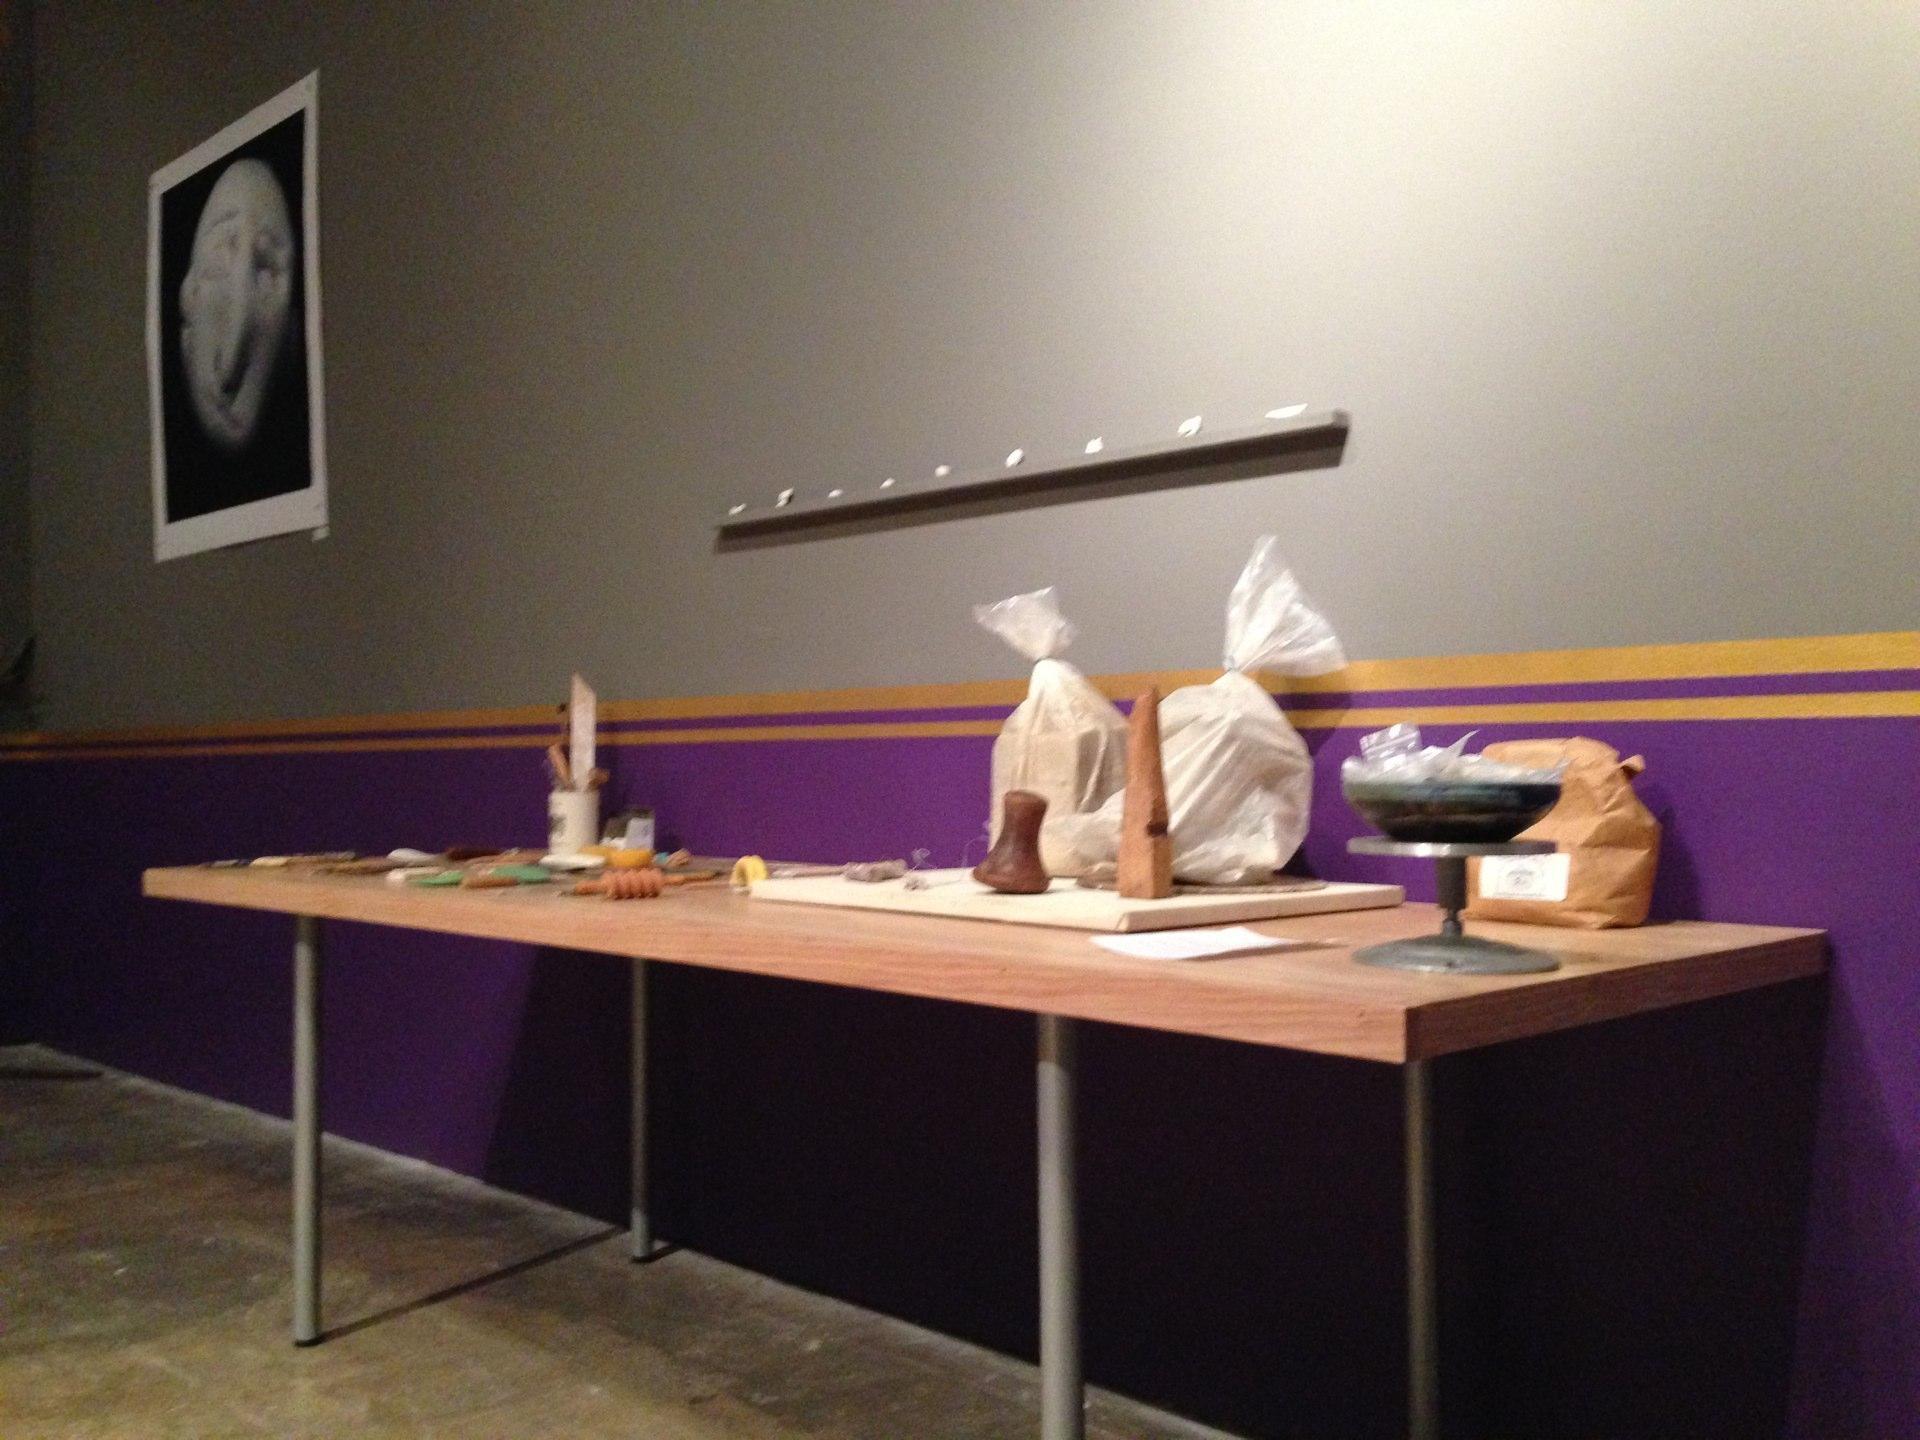 The Royal Breadshow ceramics table